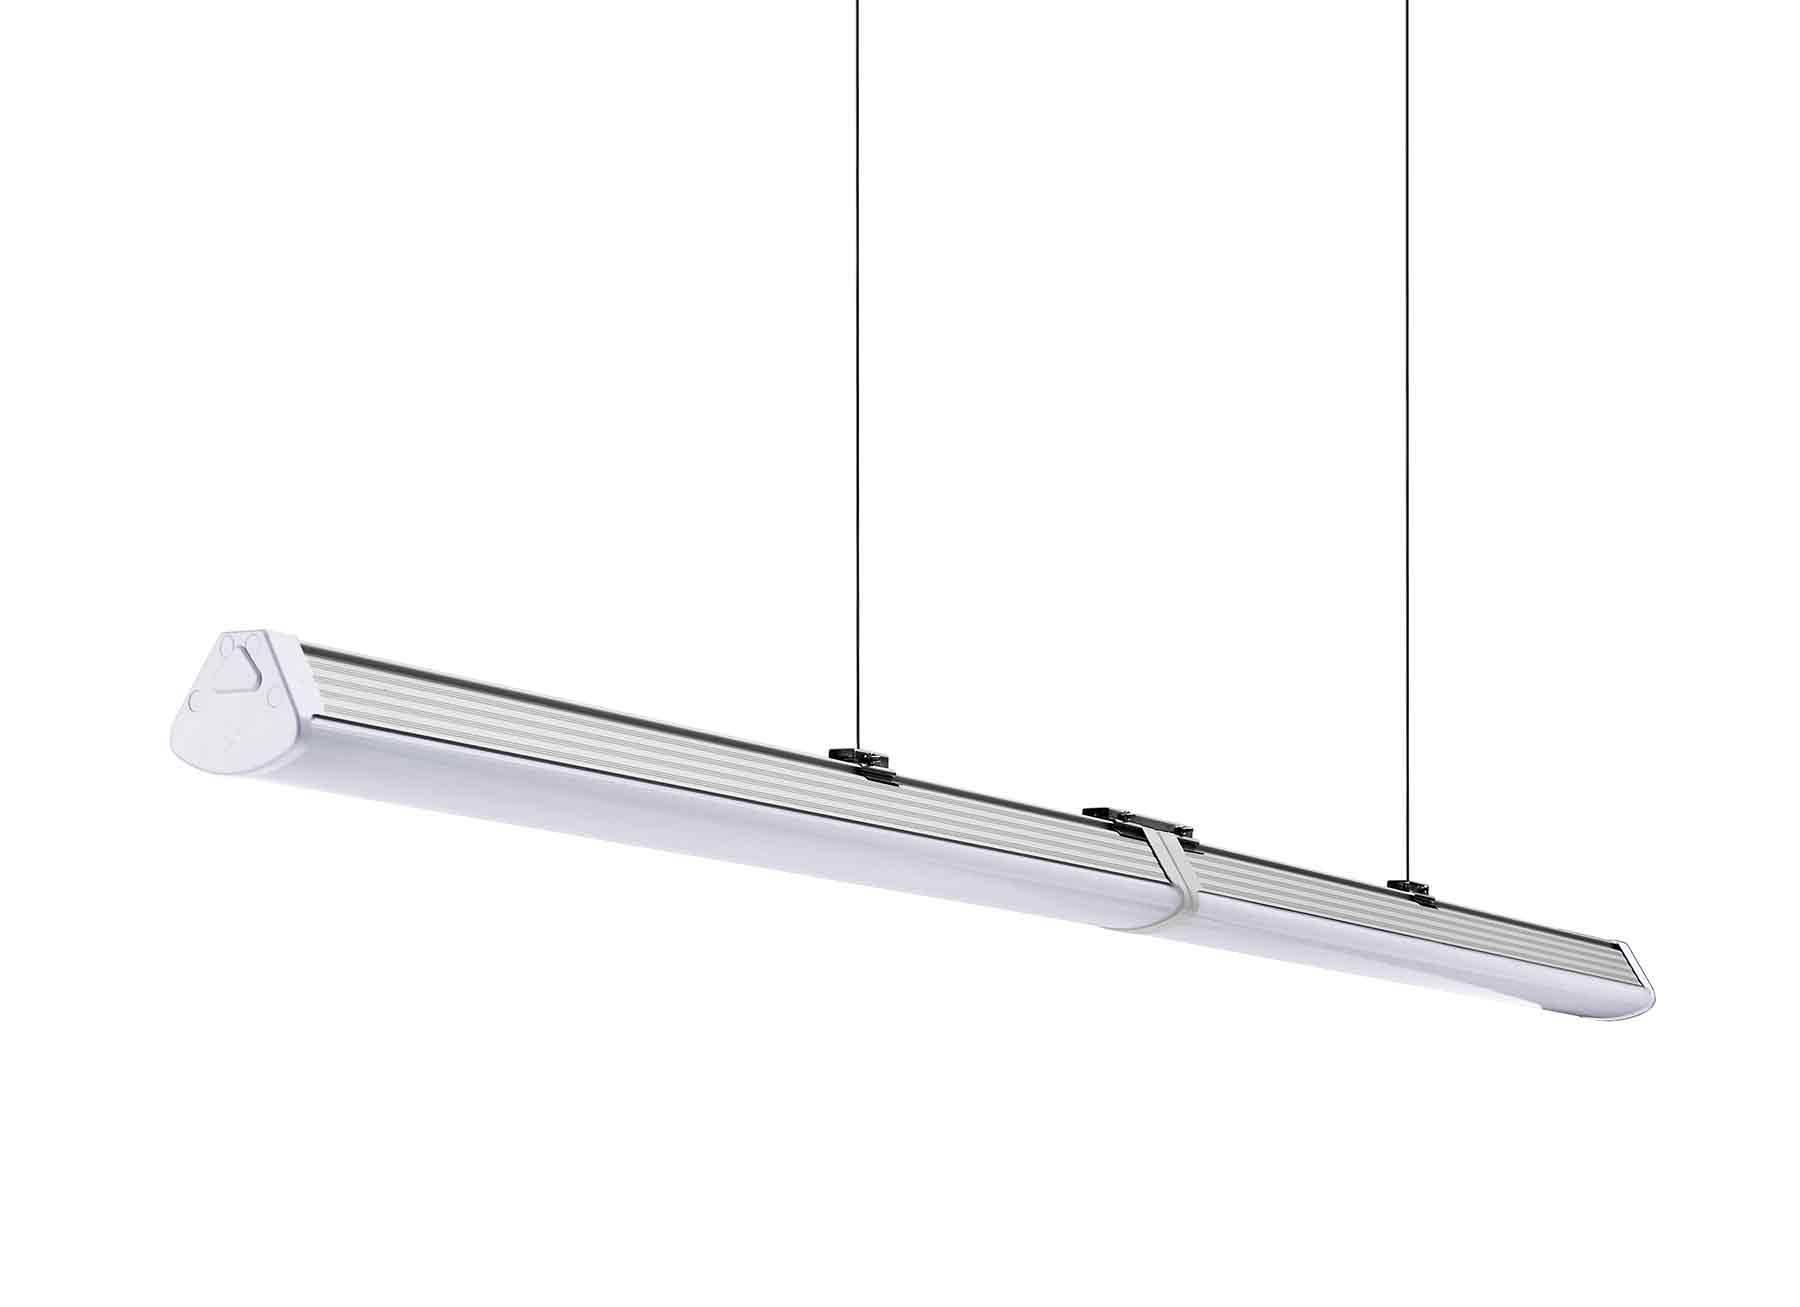 LED Linear Leuchte 40W 120cm 4000K